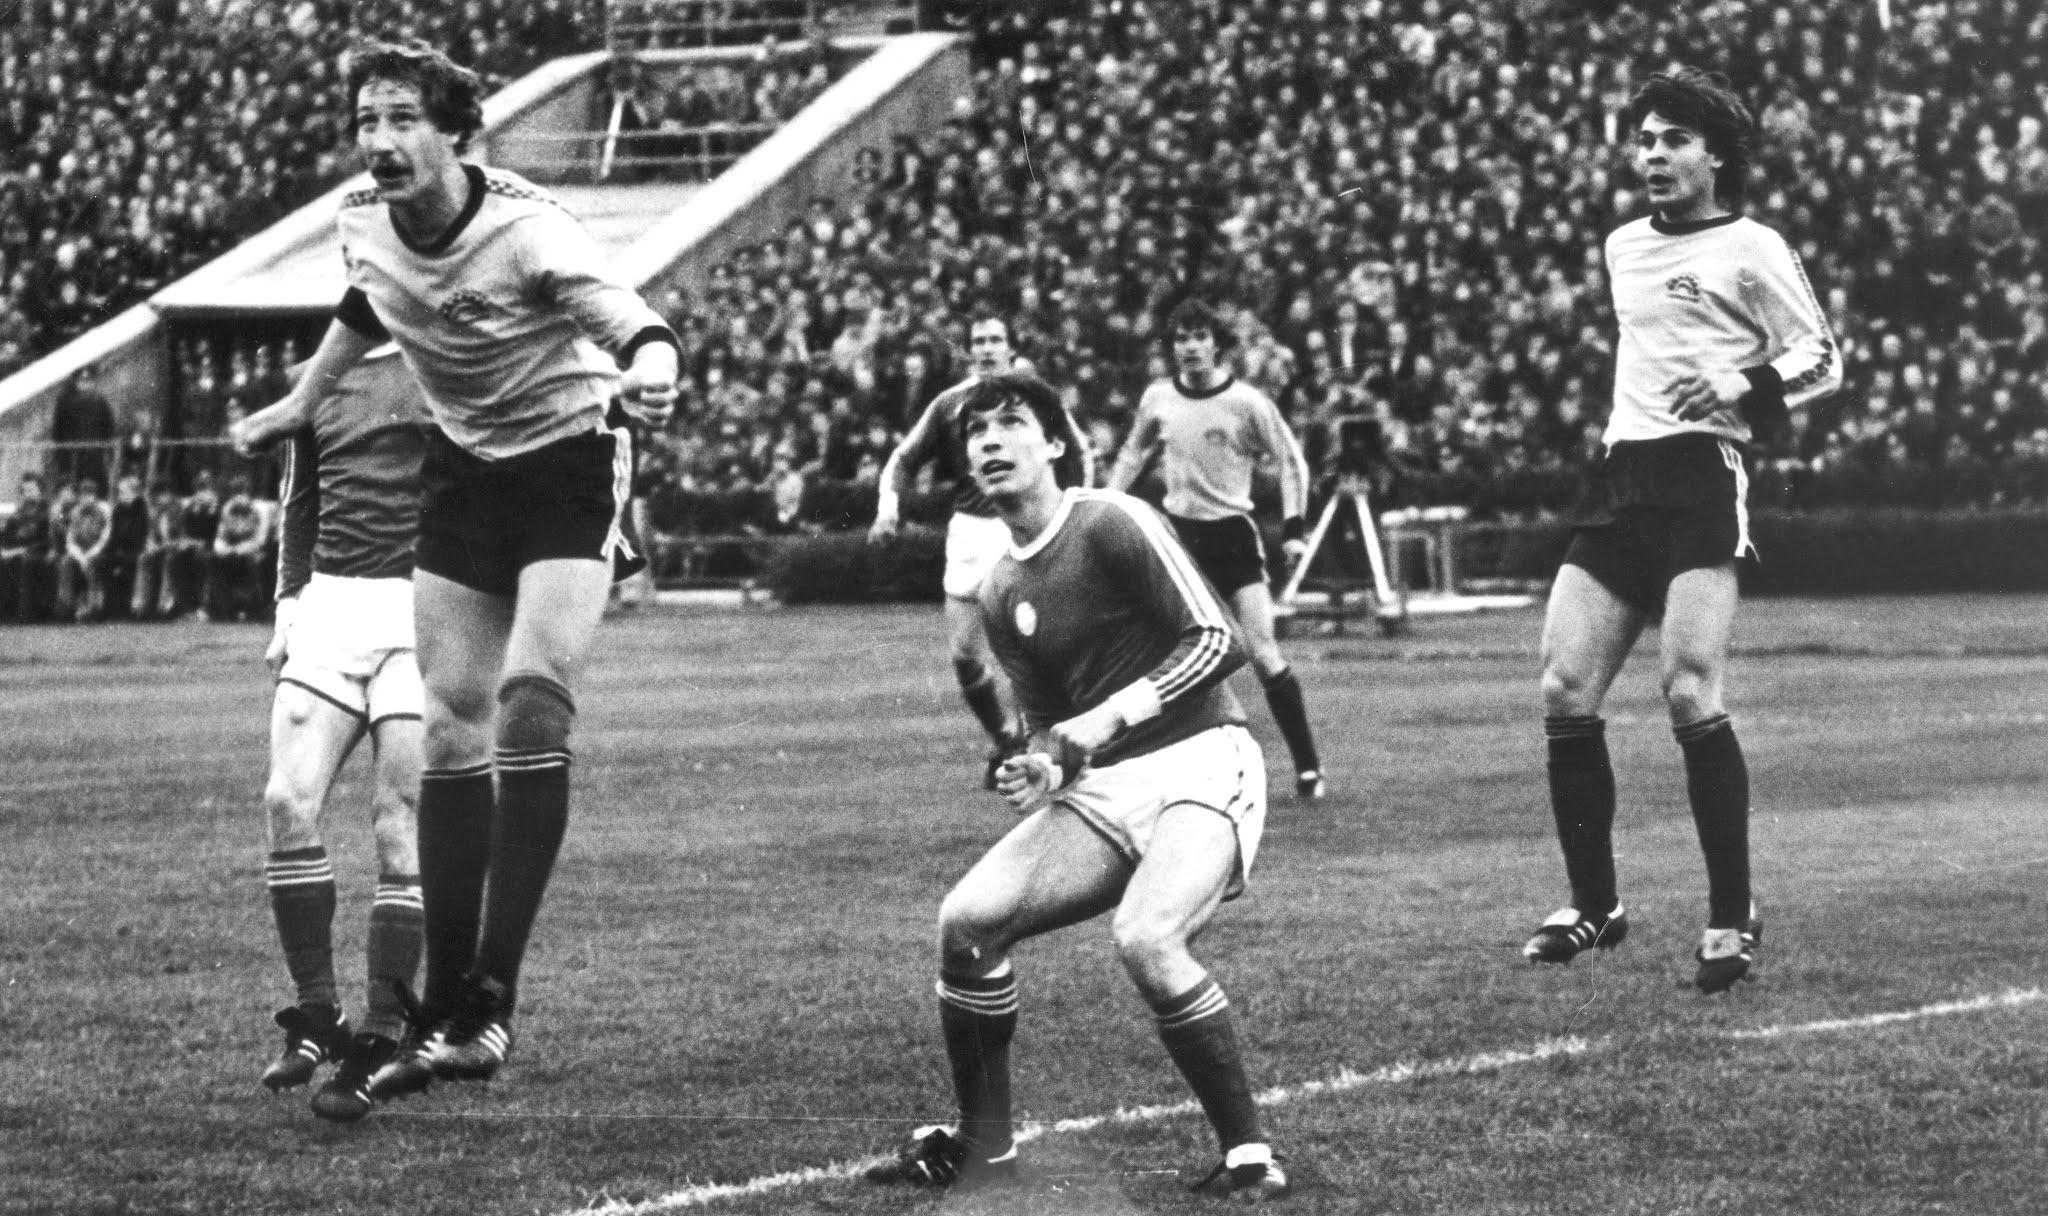 Ретро-футбол «Металлист»  80-ые годы История,Футбол,СССР